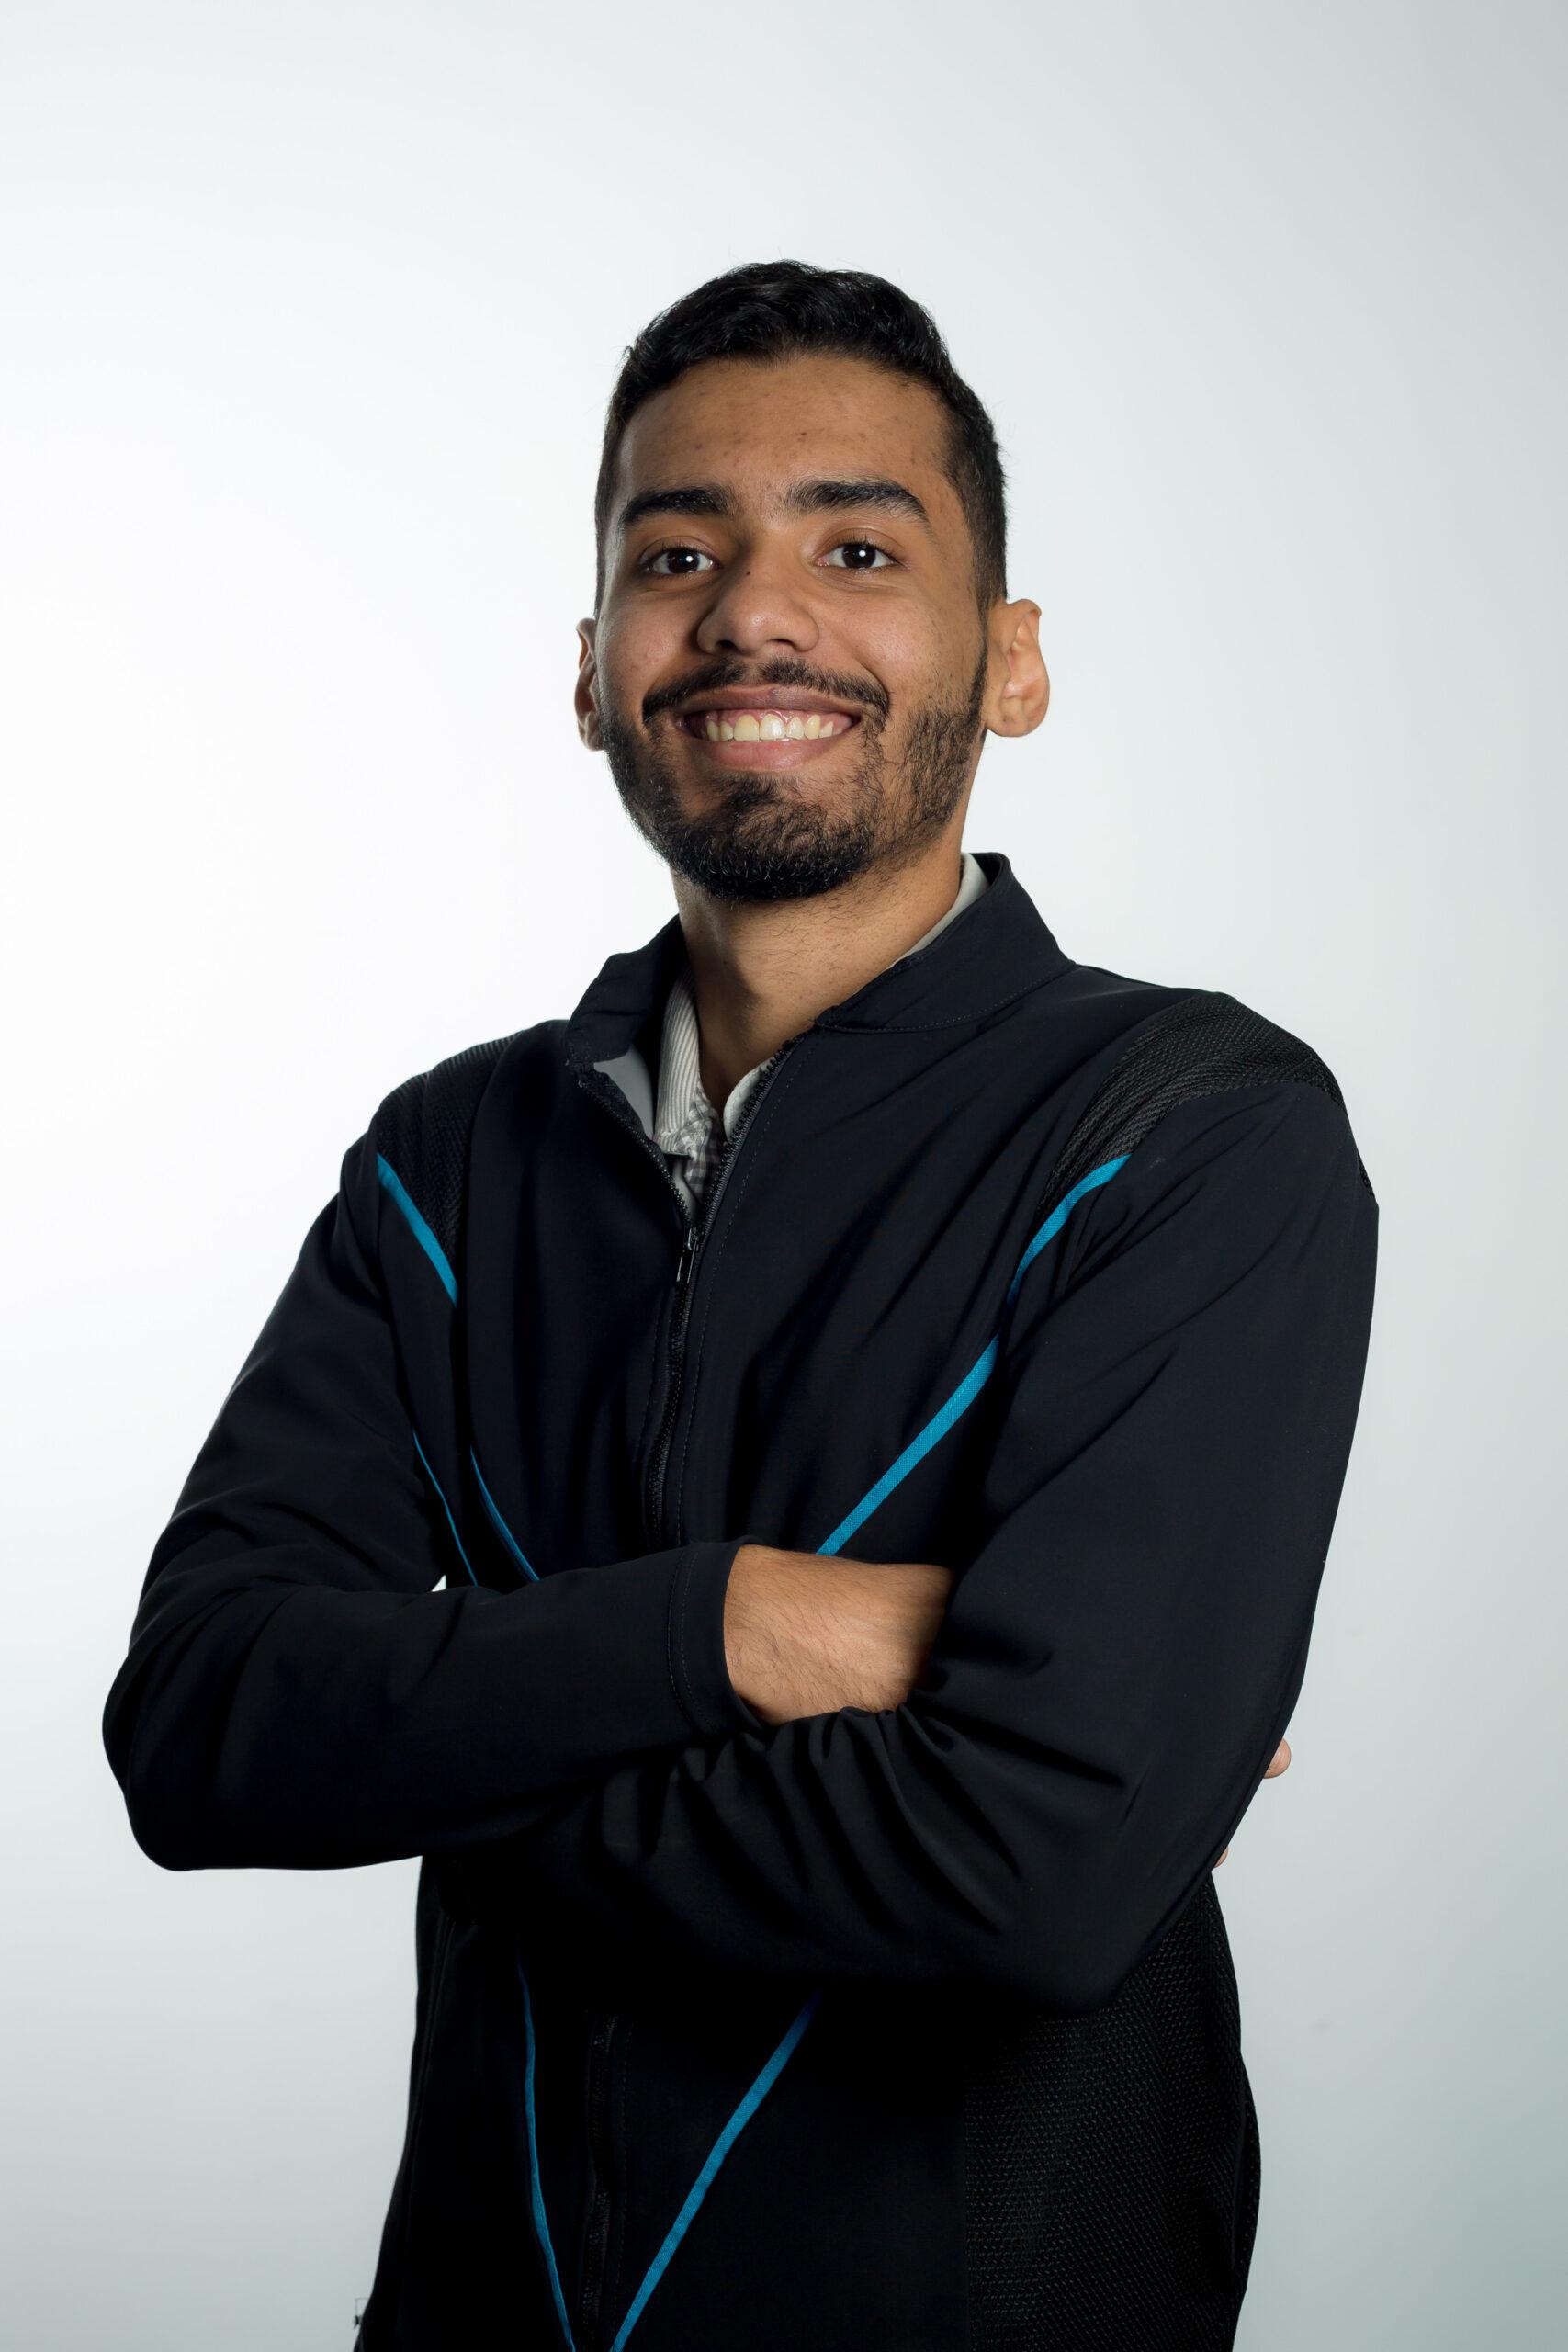 Luis Portal